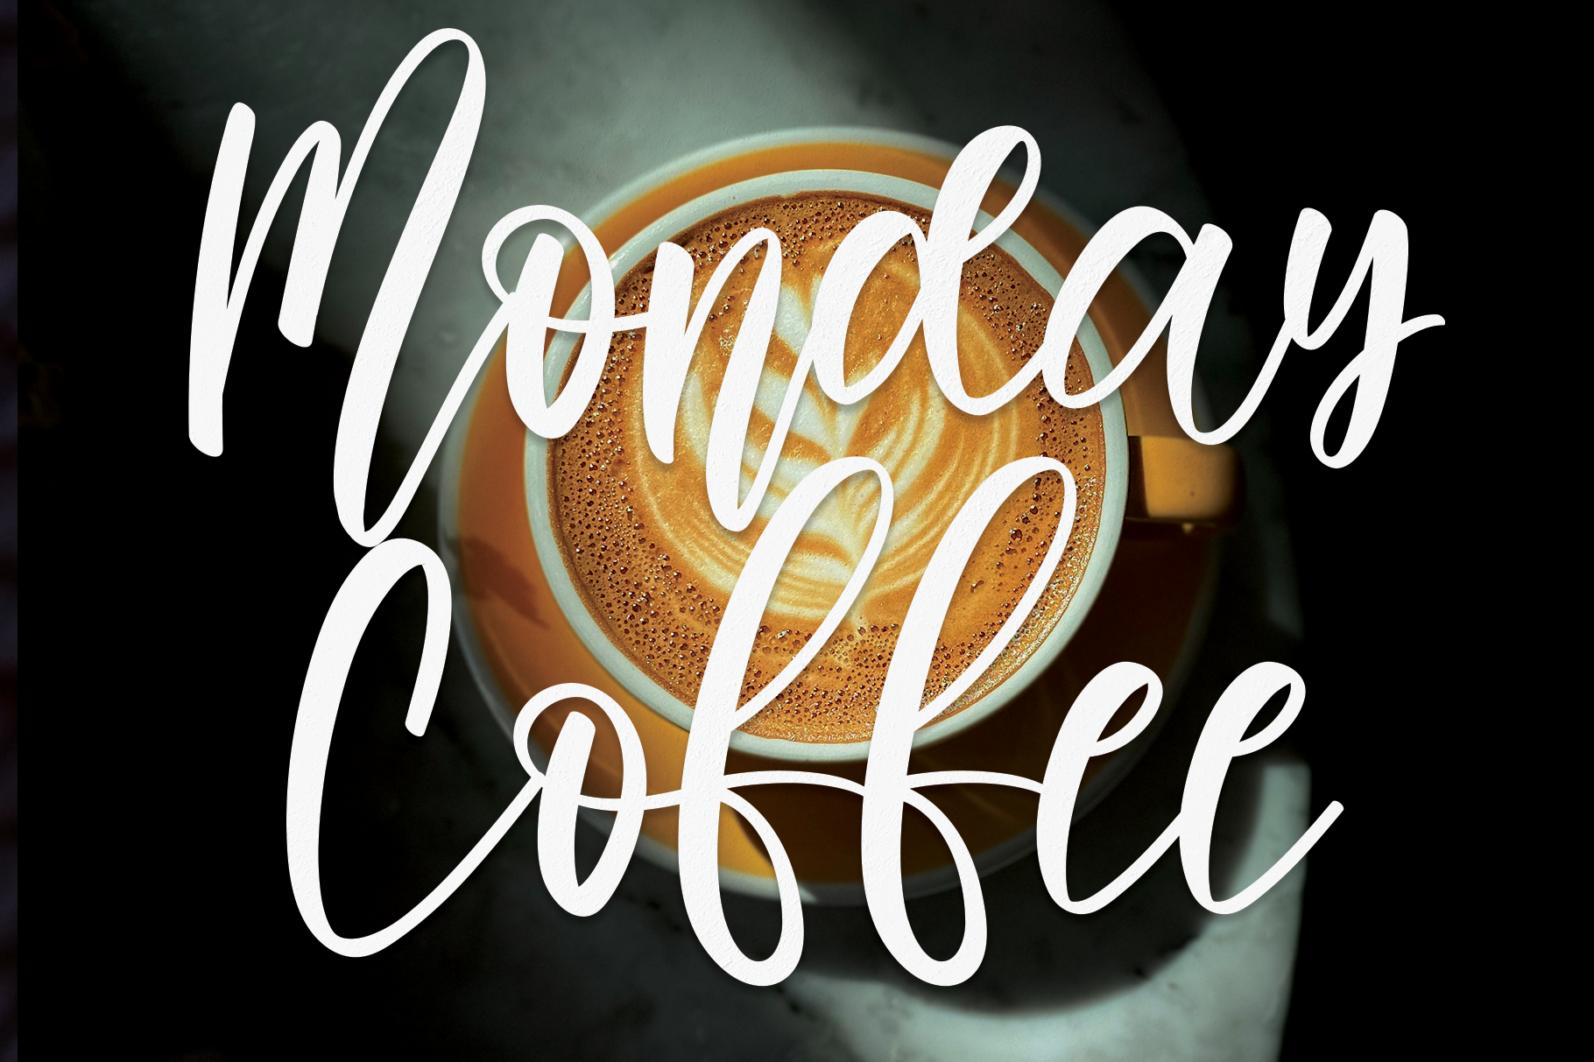 Monday Coffee - 1 114 -